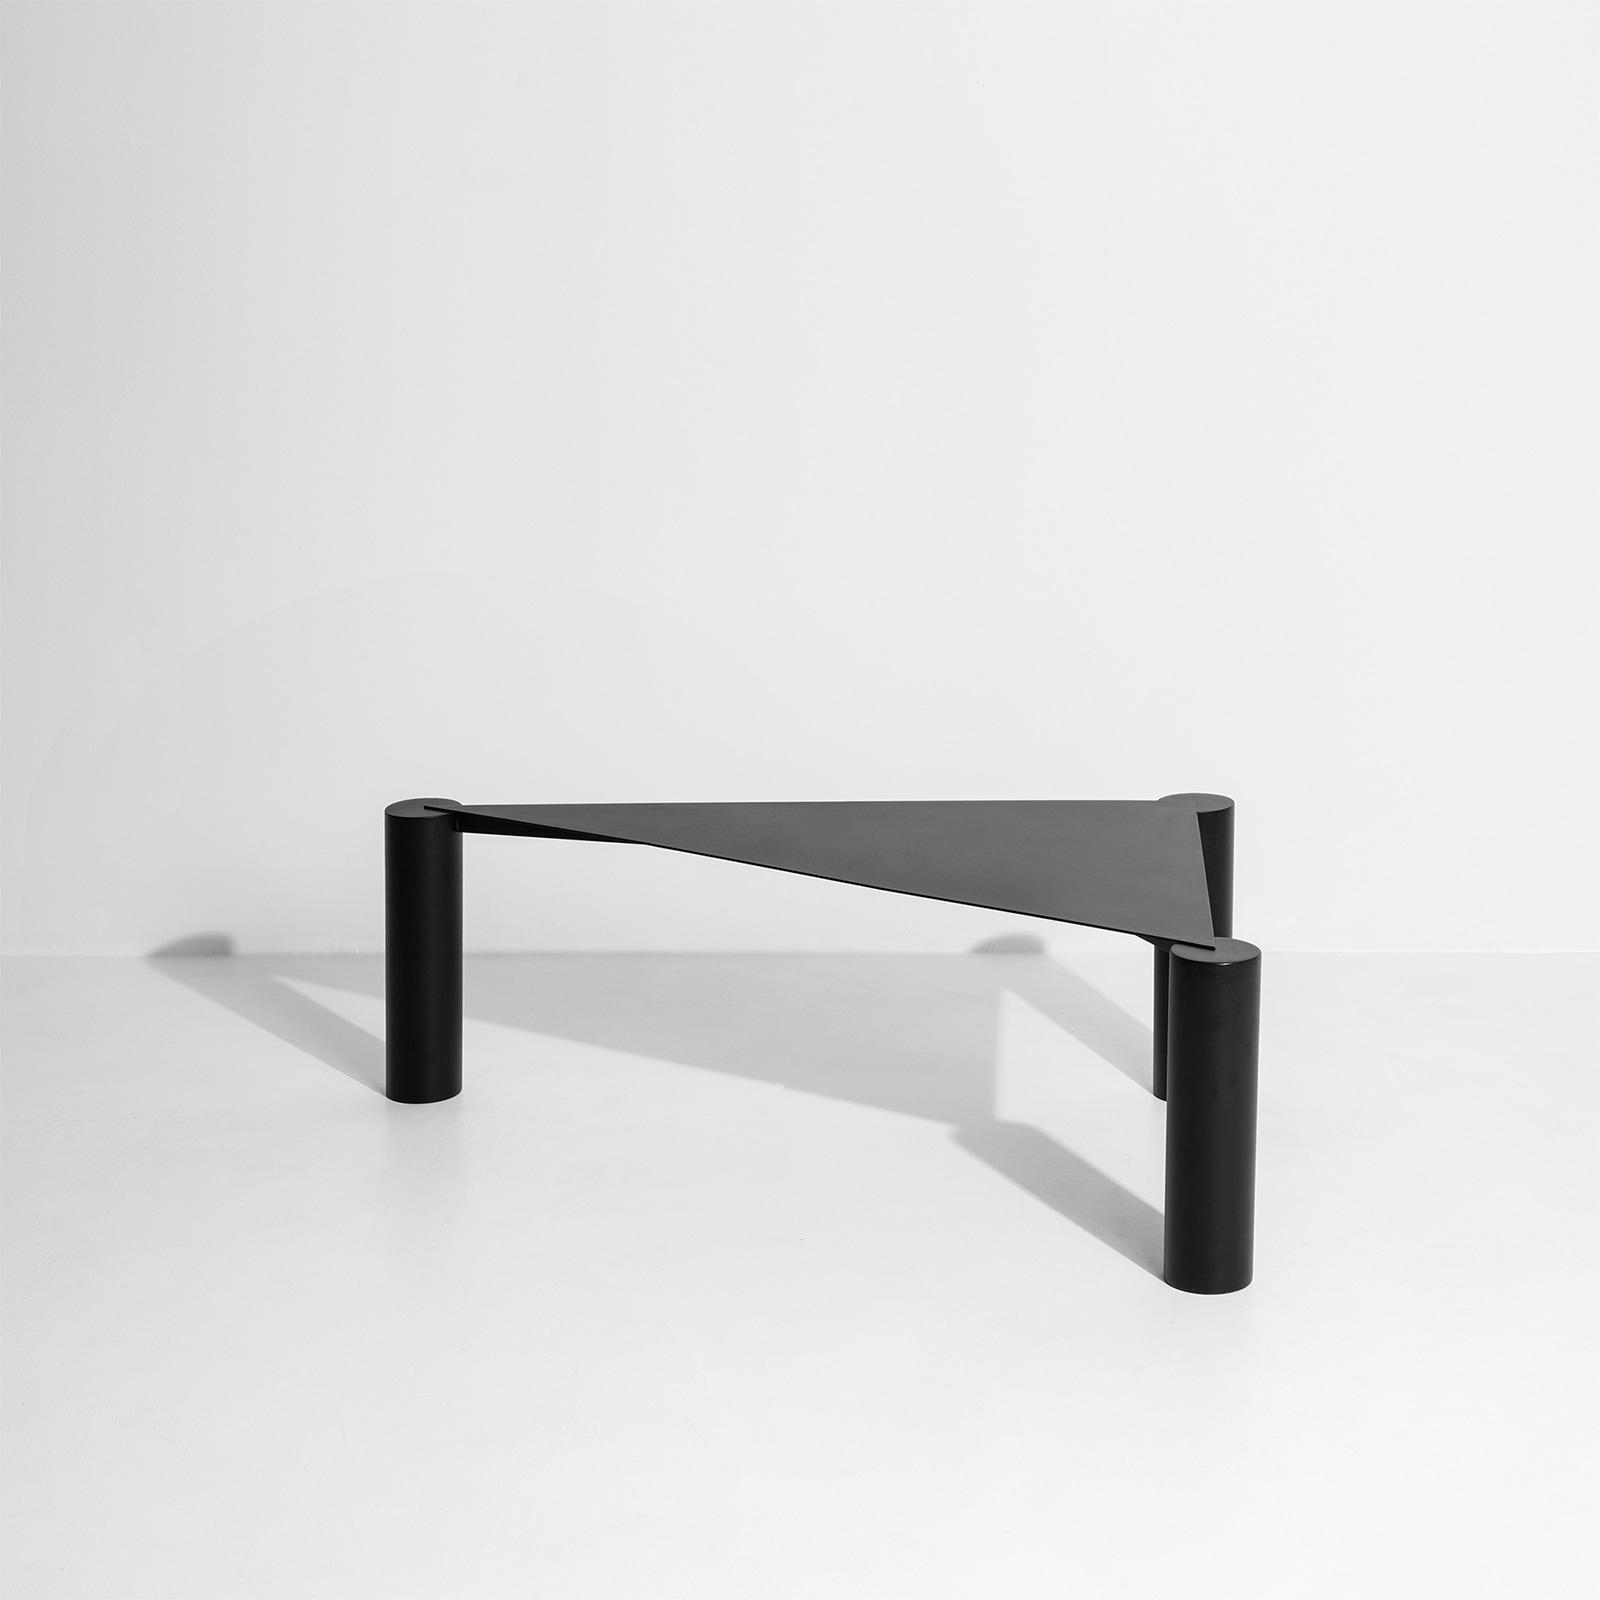 Featuring thin top oversized le - minimalissimo | ello